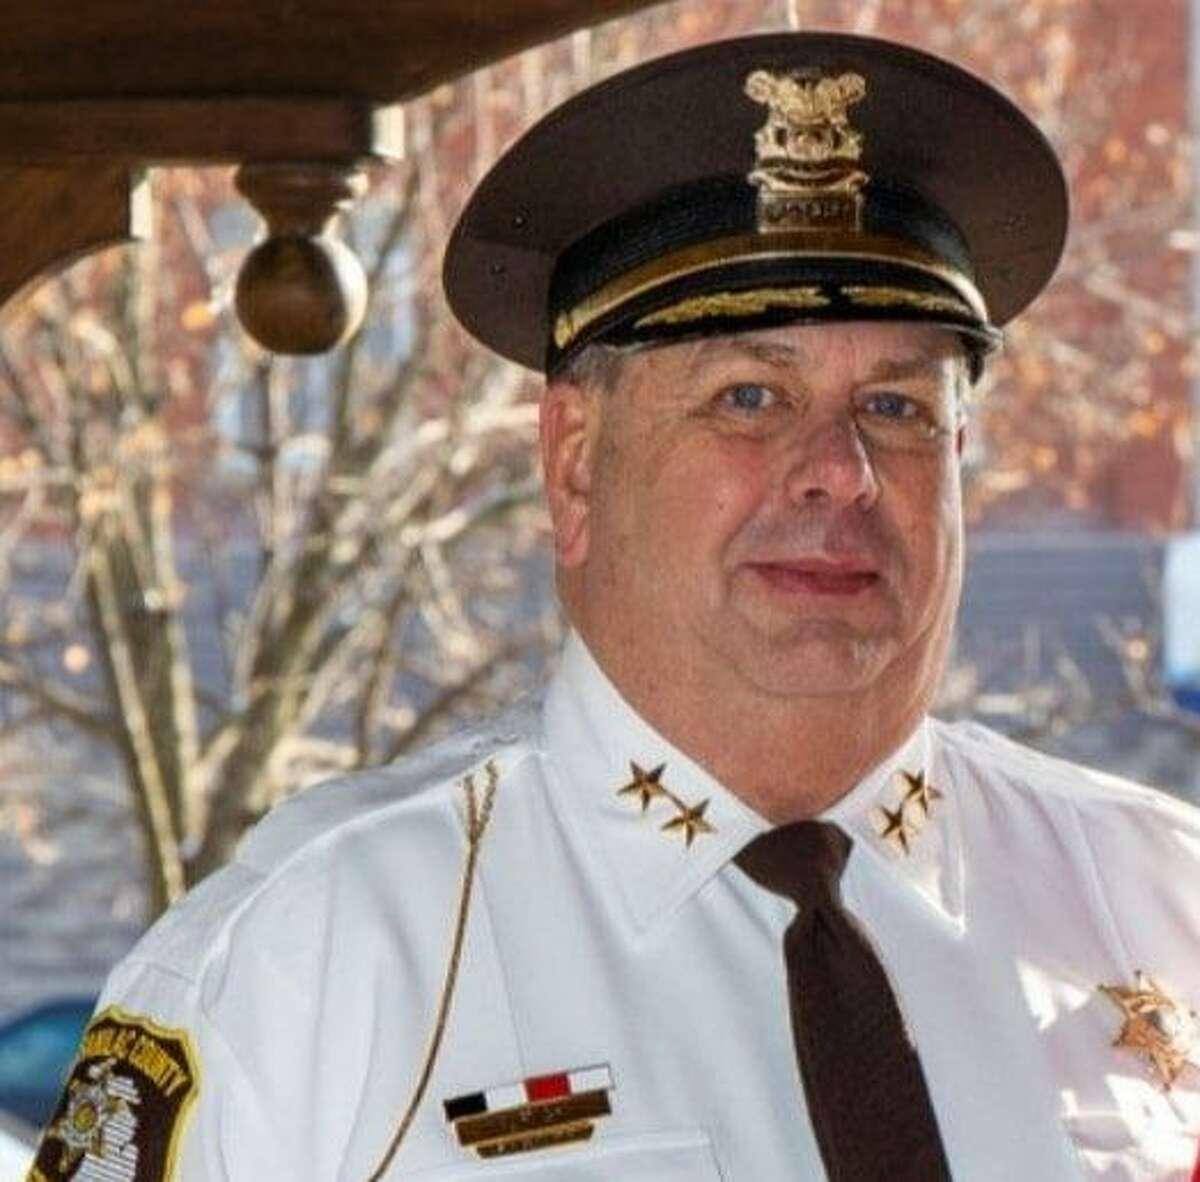 Sanilac County Sheriff Paul Rich